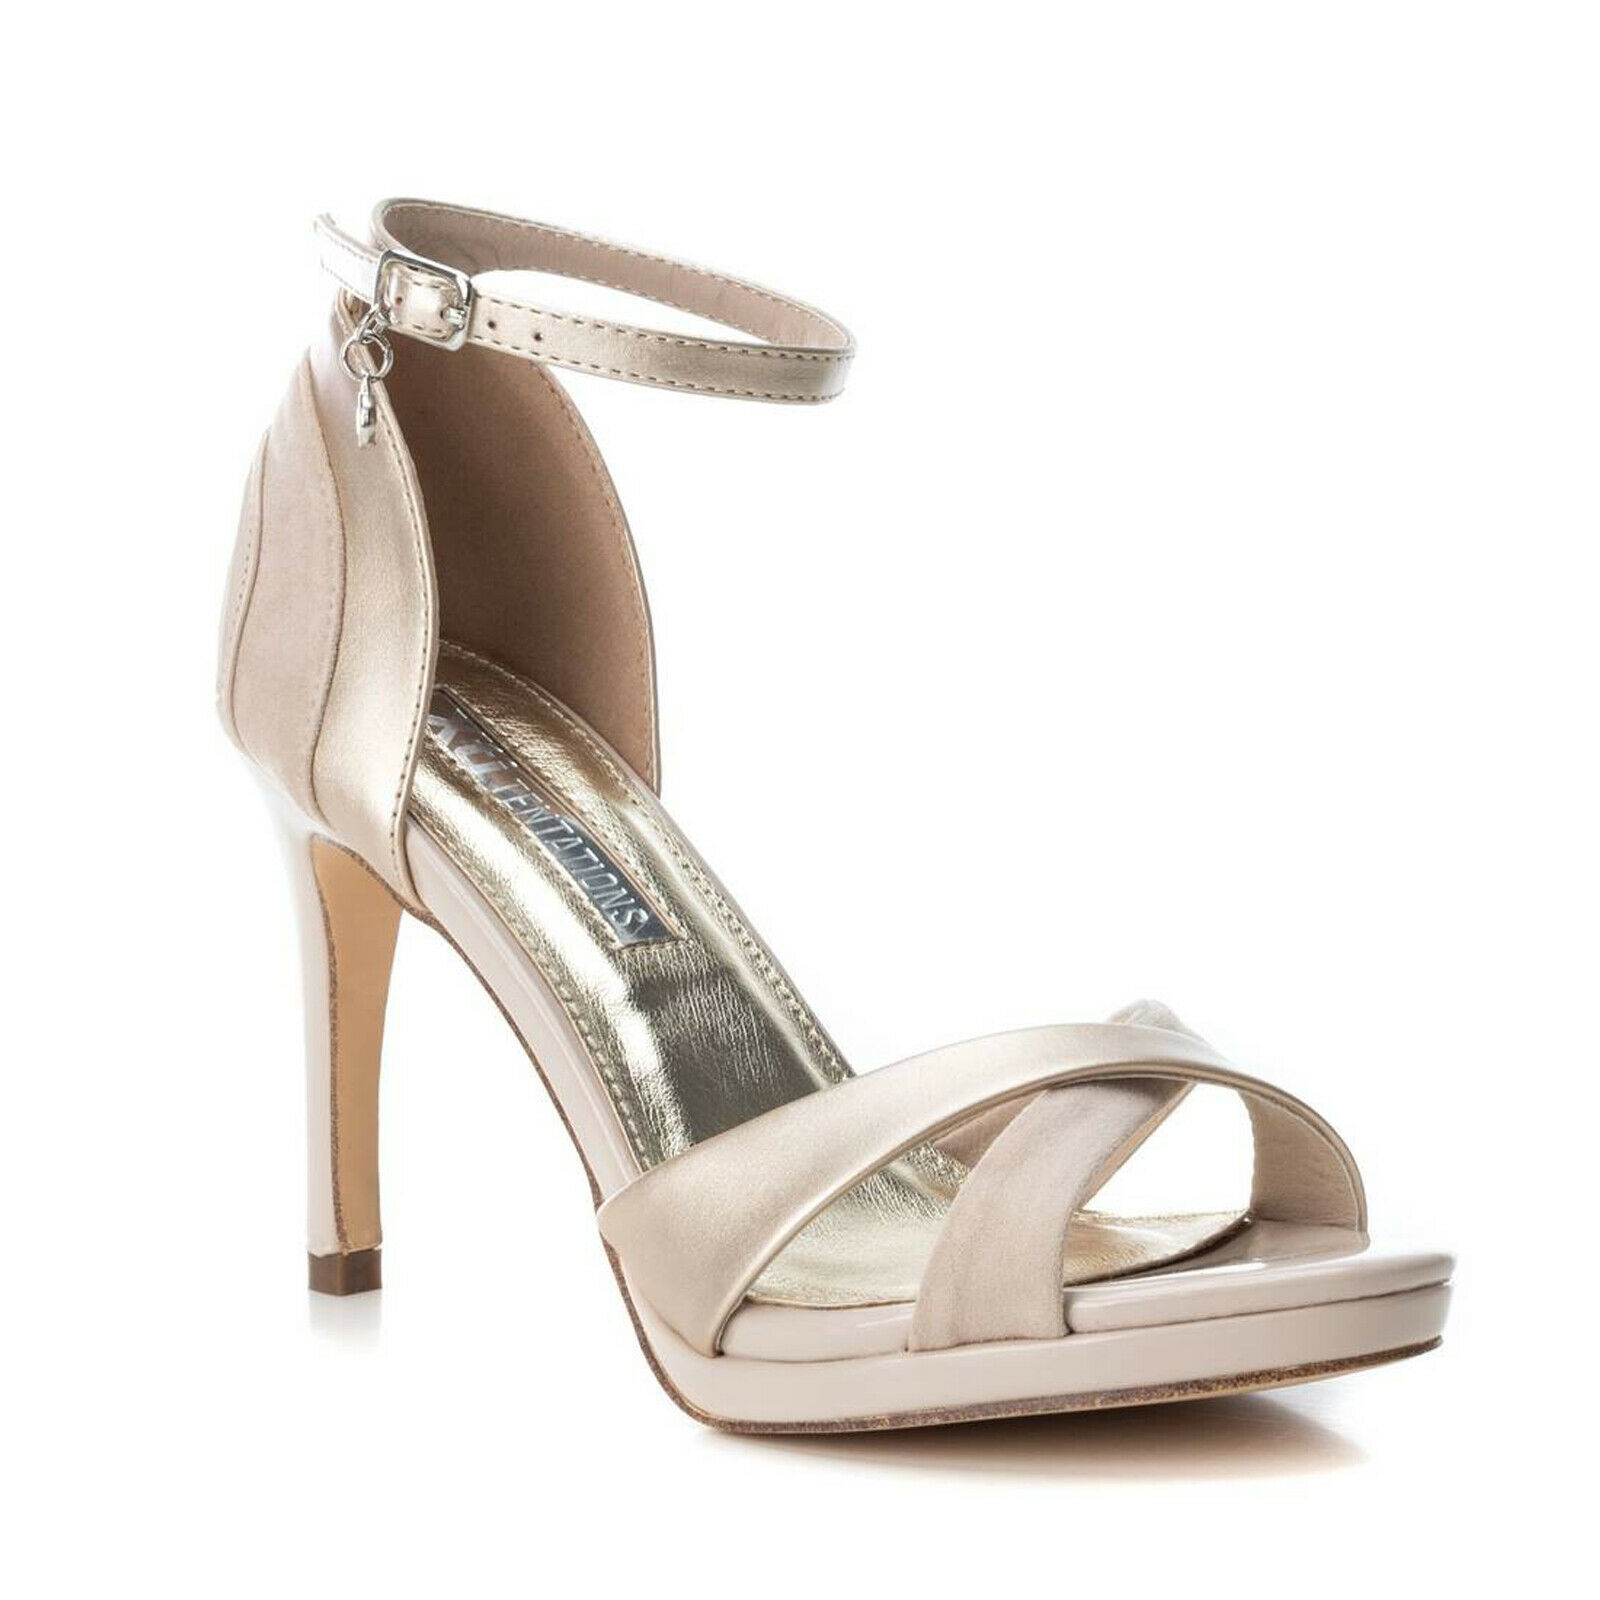 genuina alta calidad ☼ELEN☼ Sandales Sandales Sandales à talons - Xti - Ref   1013  nuevo estilo